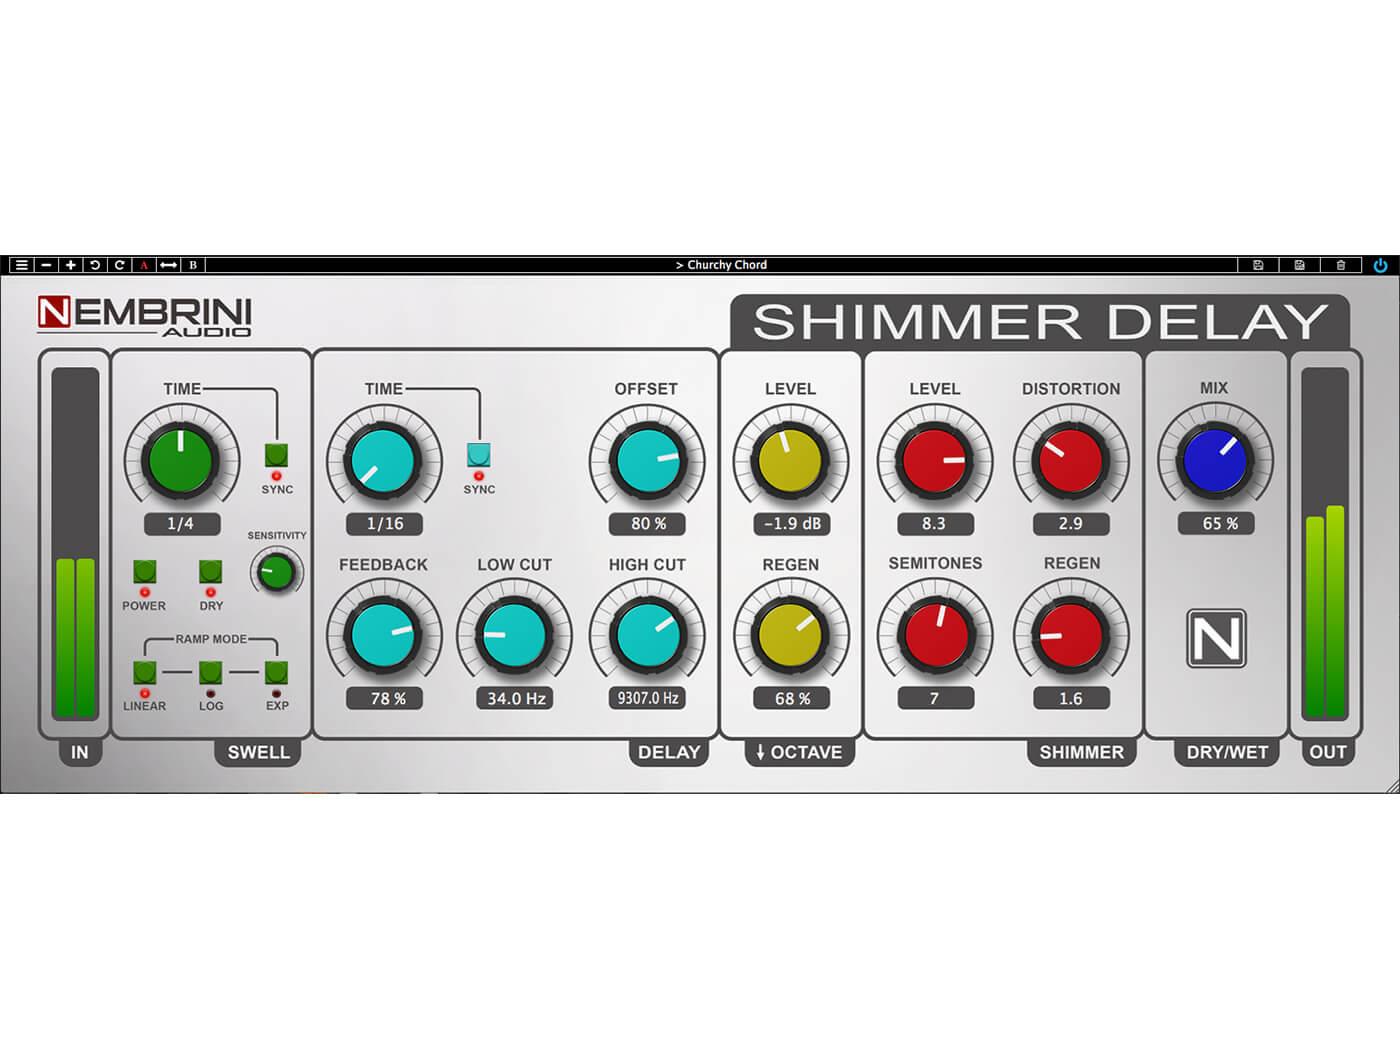 Nembrini Audio Shimmer Delay Ambient Machine